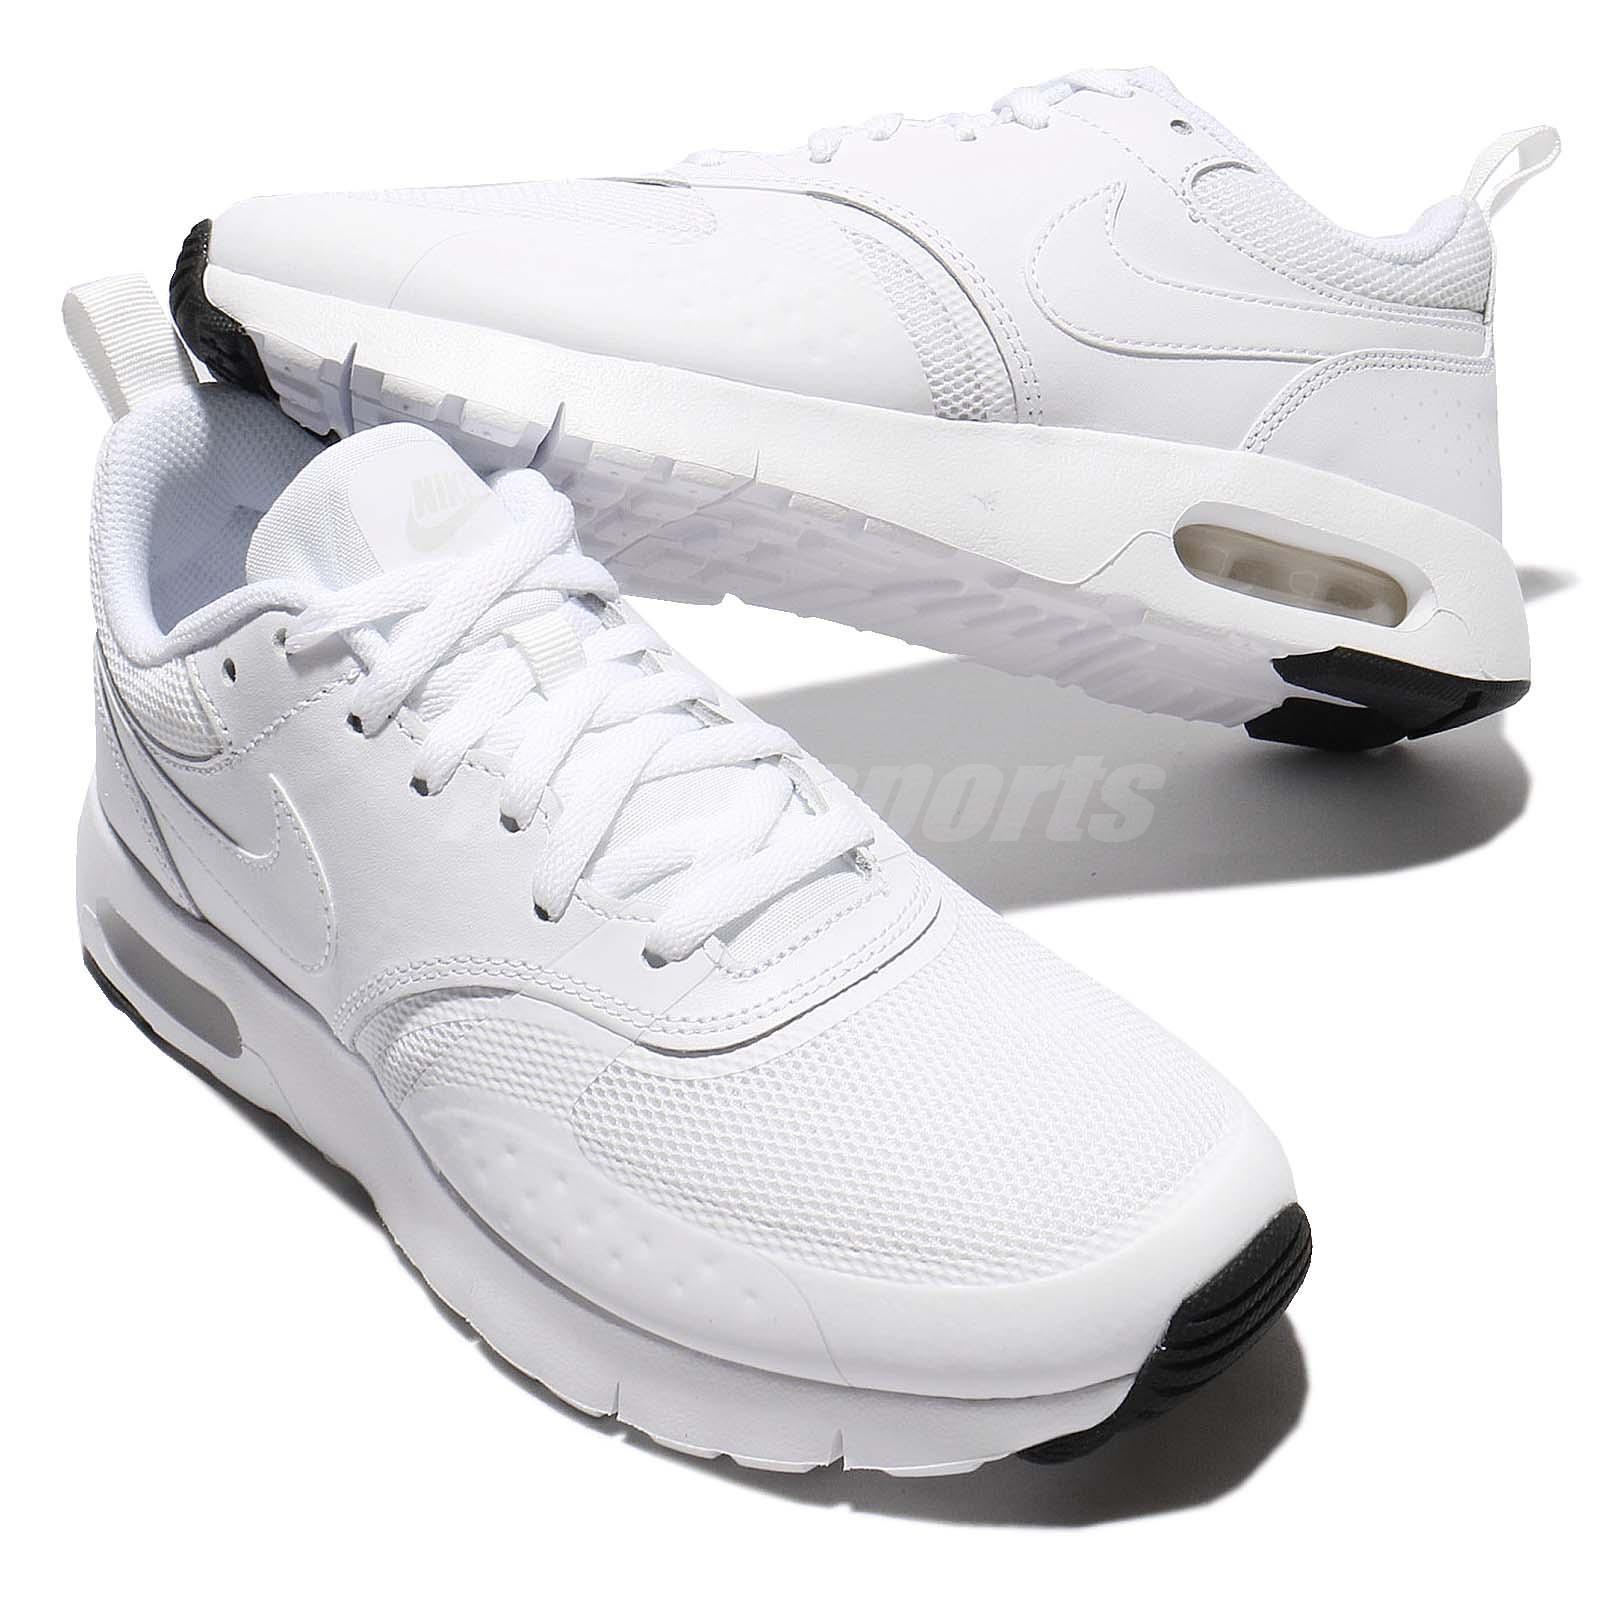 sports shoes 889a5 eea8b Nike Air Max Vision GS White Pure Platinum Kids Running Shoes ...